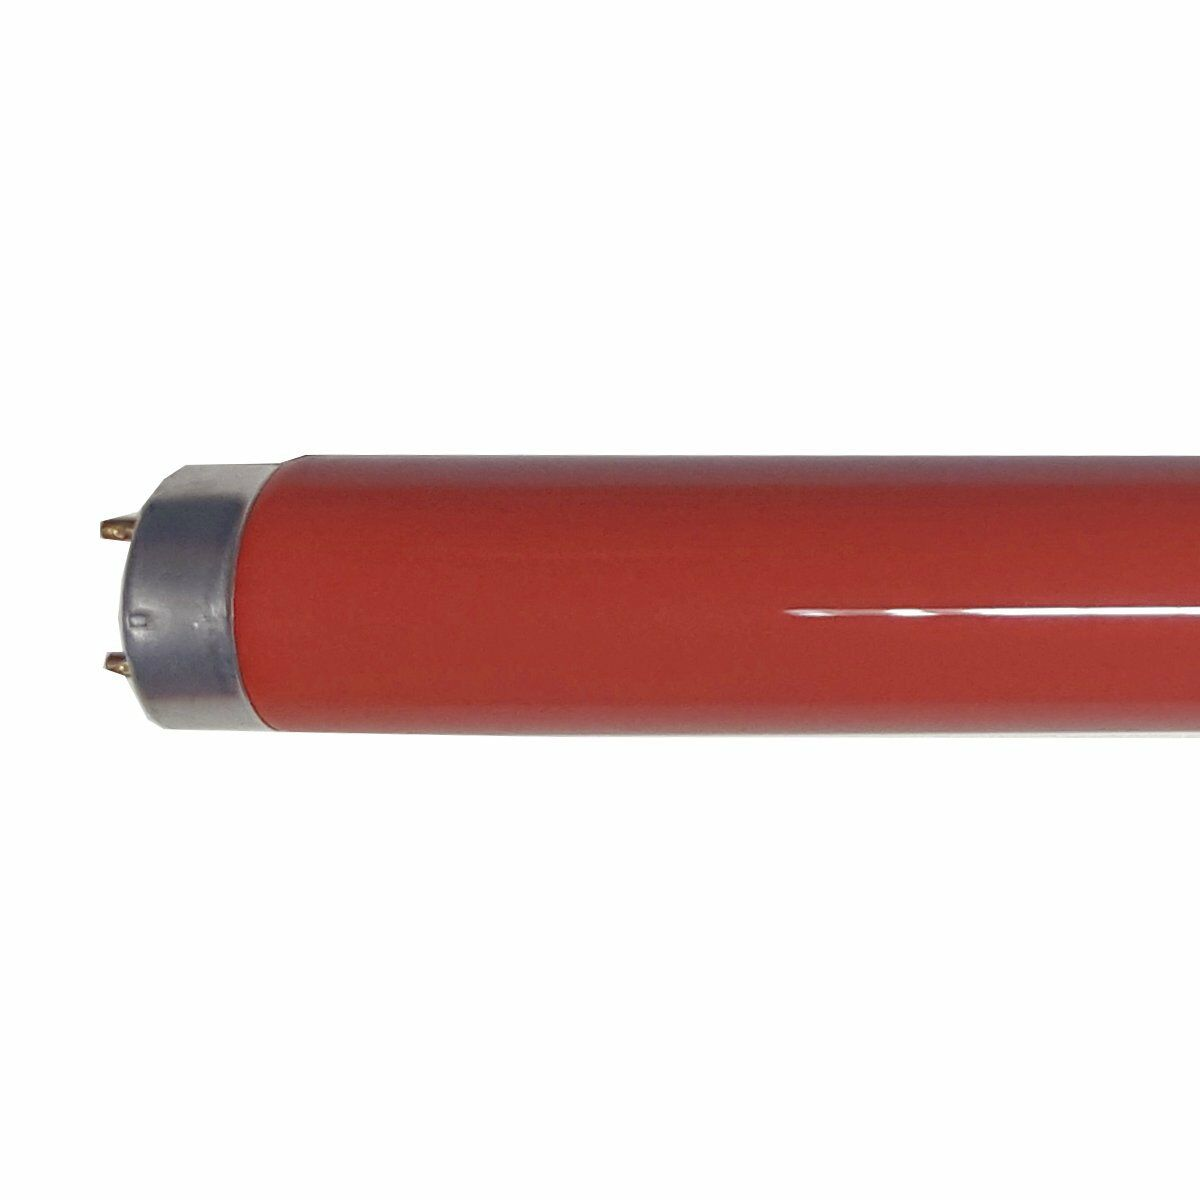 10x Philips Leuchtstoffröhre MASTER TL-D - T8, 150 Rot - 36W Röhre Leuchmittel